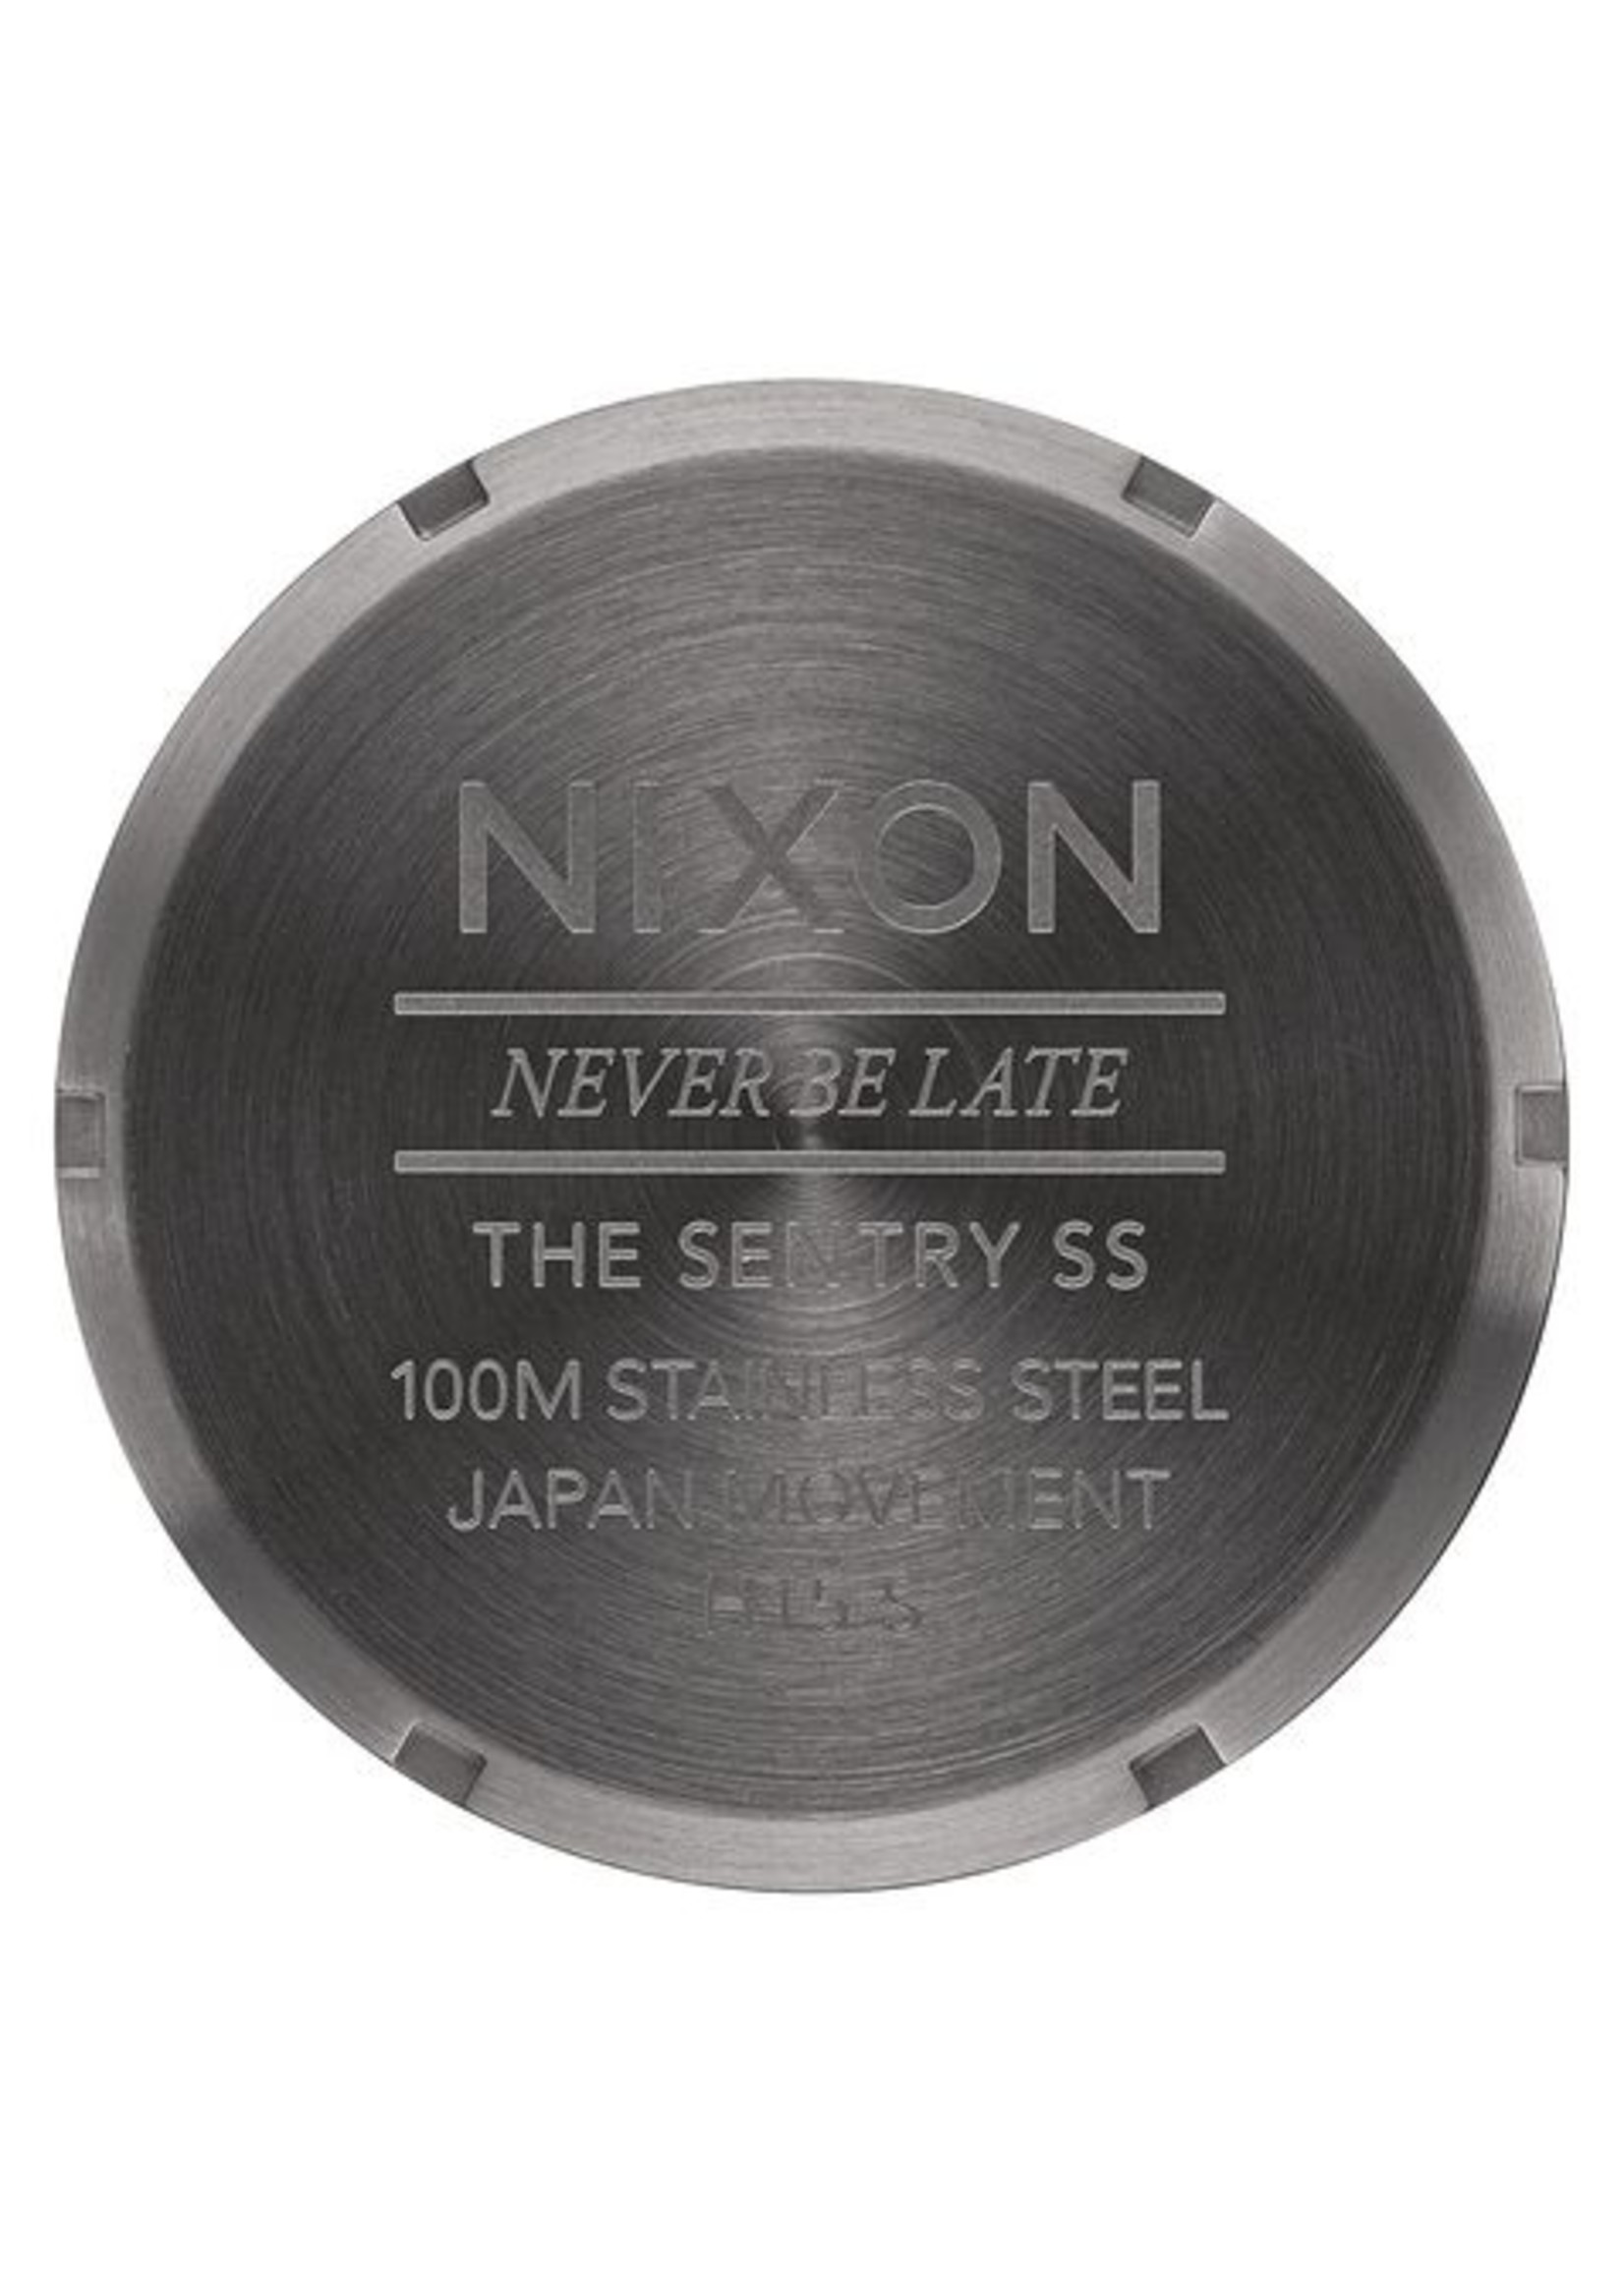 NIXON SENTRY SS, All Gunmetal